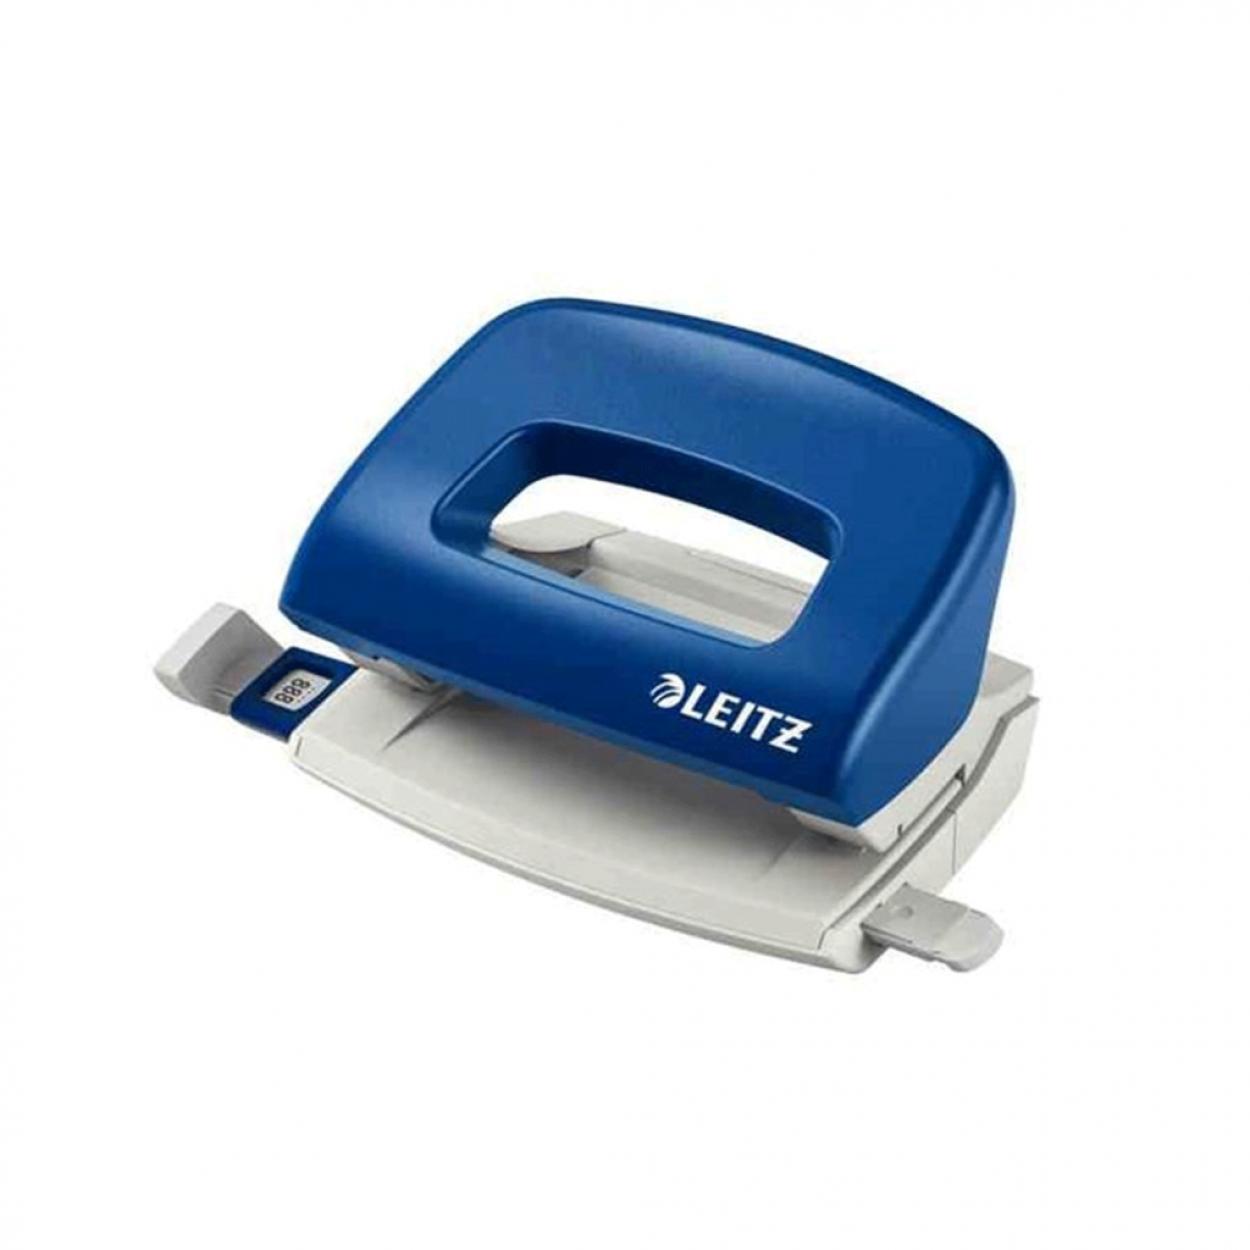 Leitz 5058 Delgeç Masa Tipi 10 Sayfa Kapasiteli Mavi